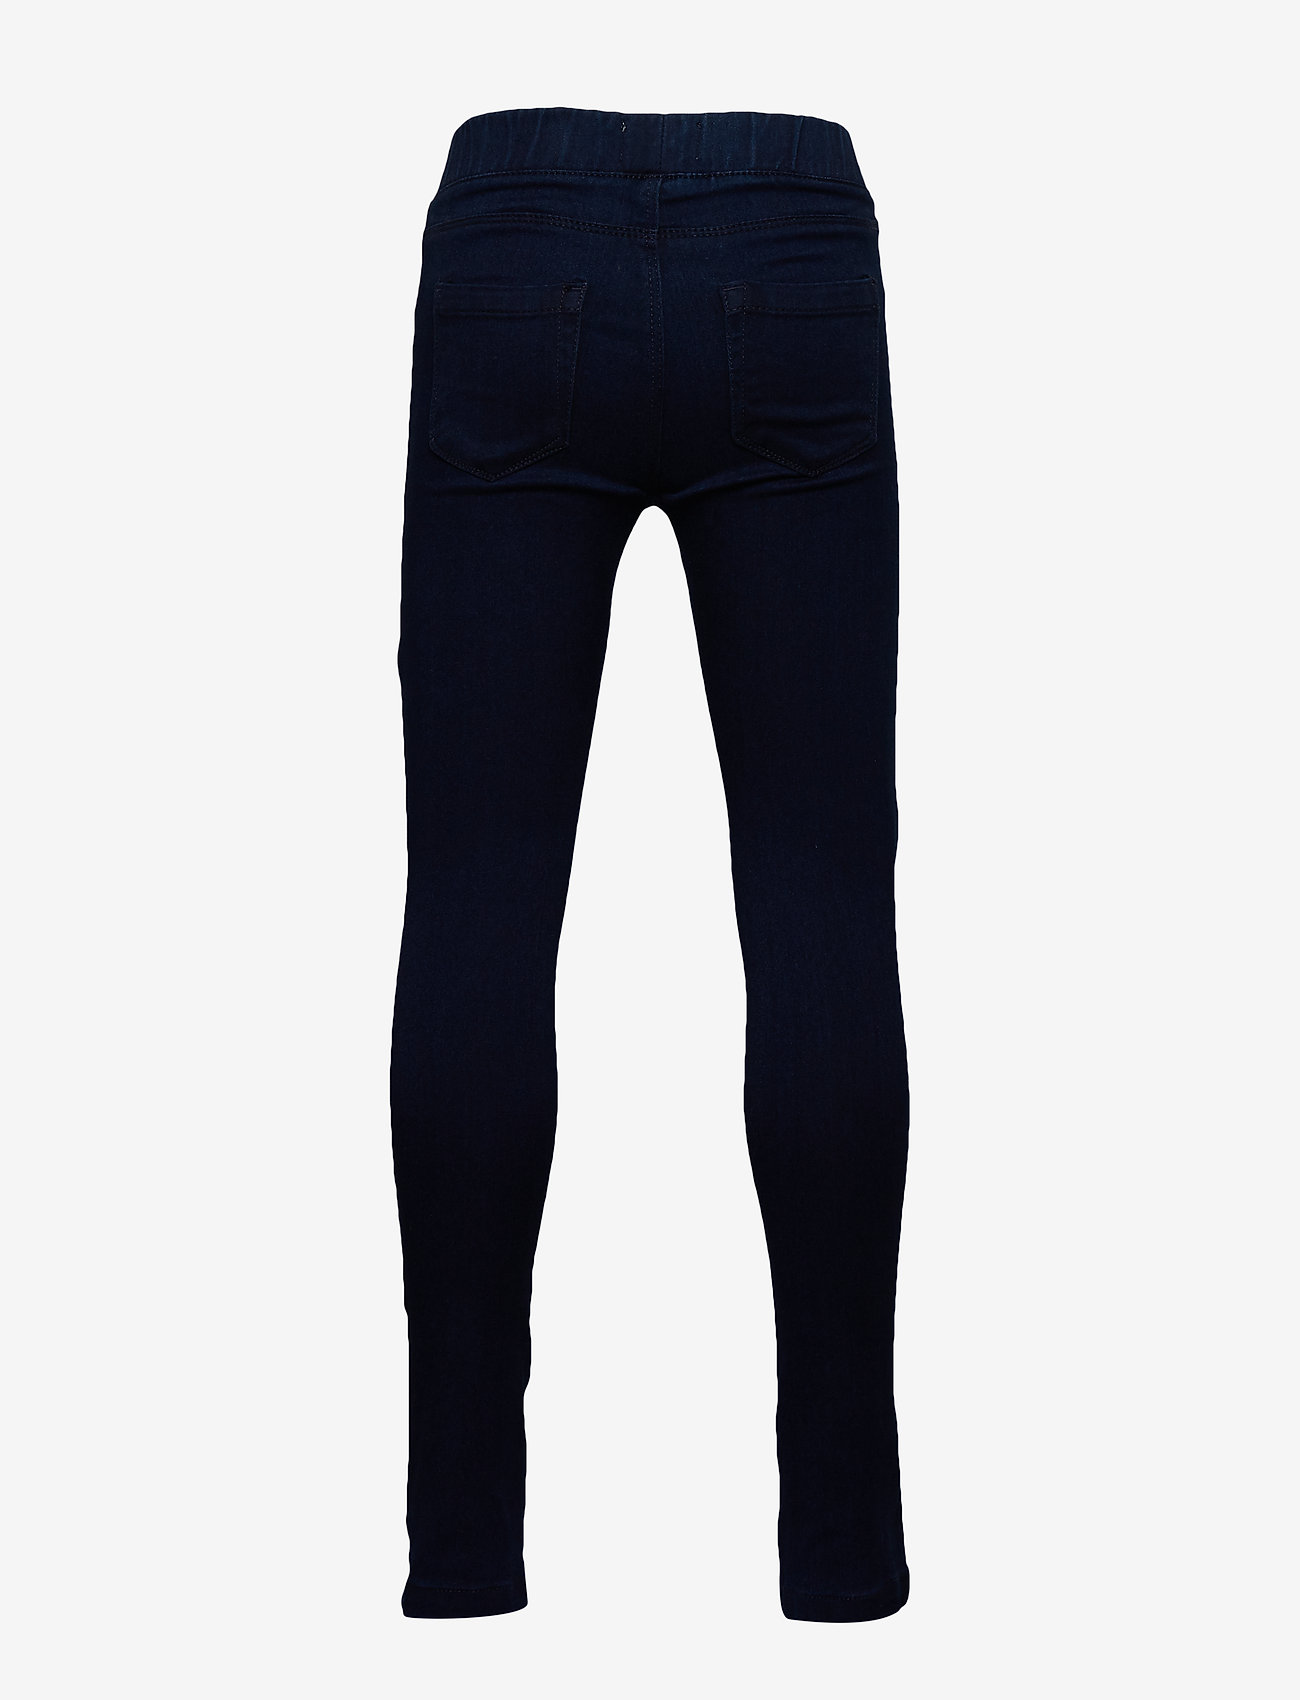 Kids Only - KONJUNE ROYAL DNM JEGGINGS 501 - jeans - dark blue denim - 1